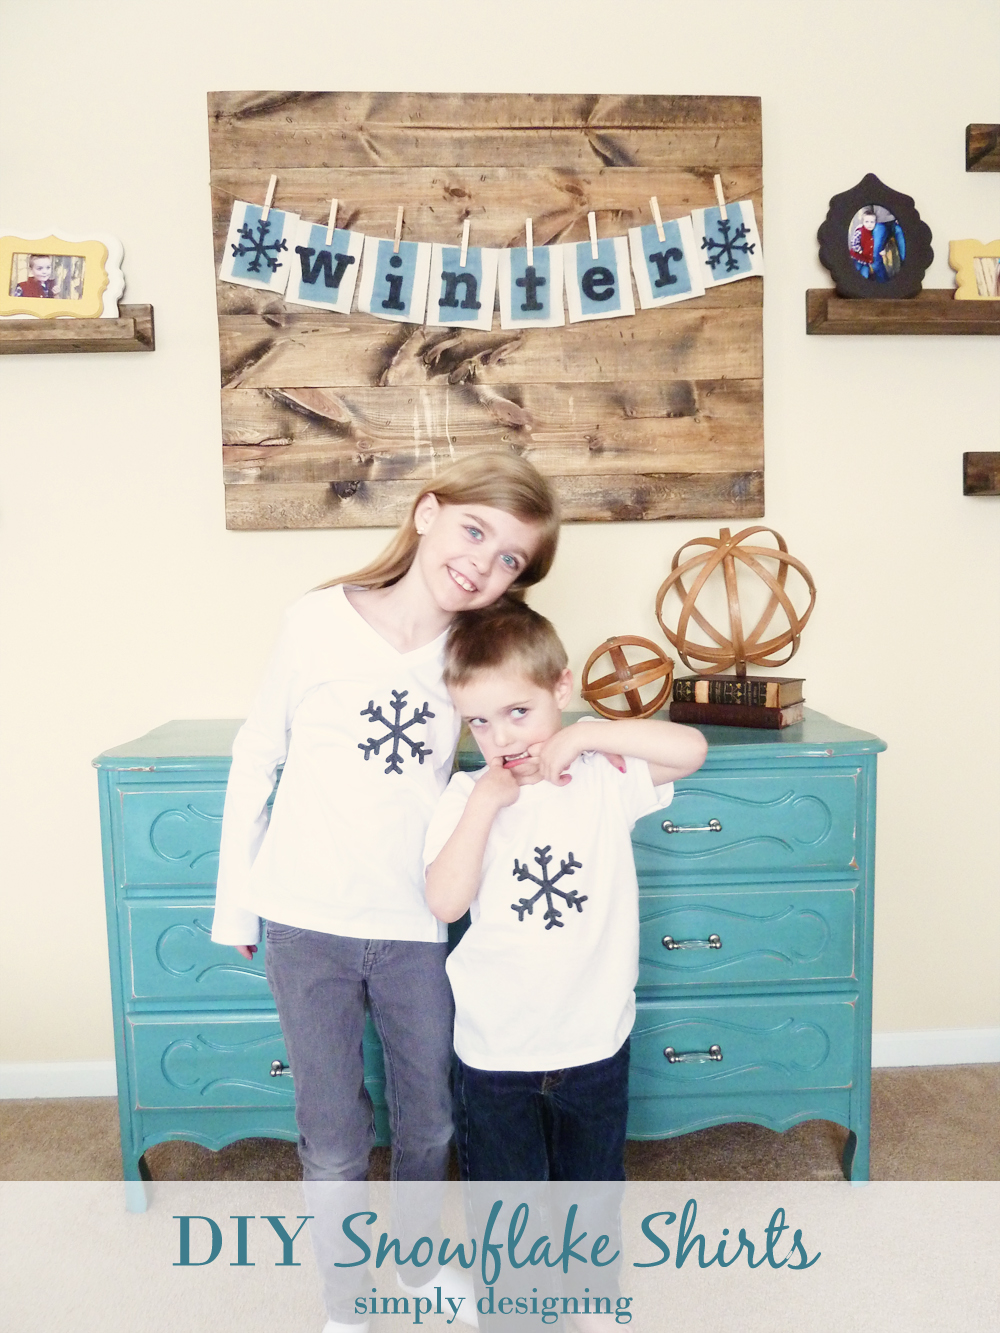 diy+snowflake+shirts Snowflake Shirt 5